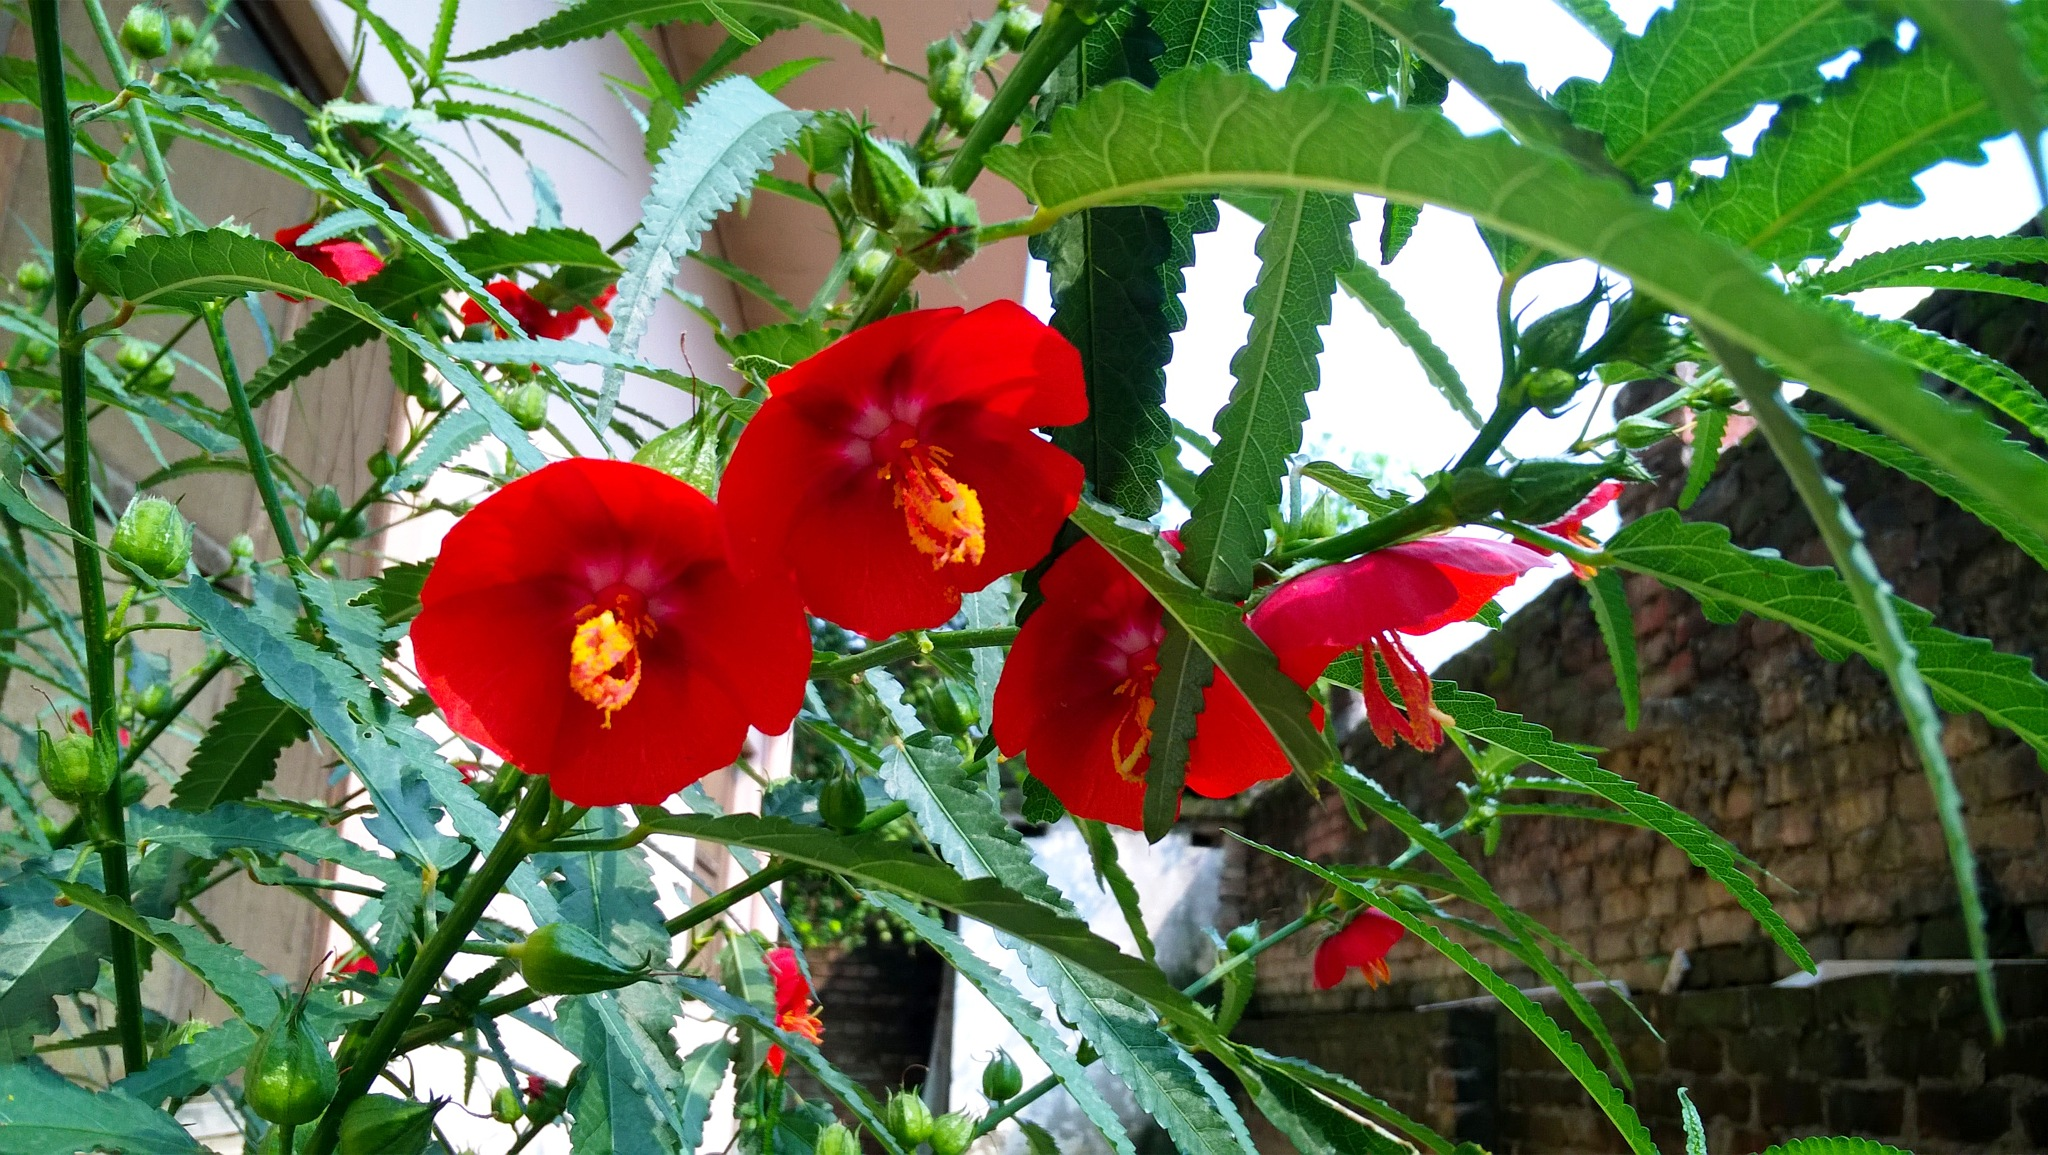 Flowers around us by Suresh Tewari